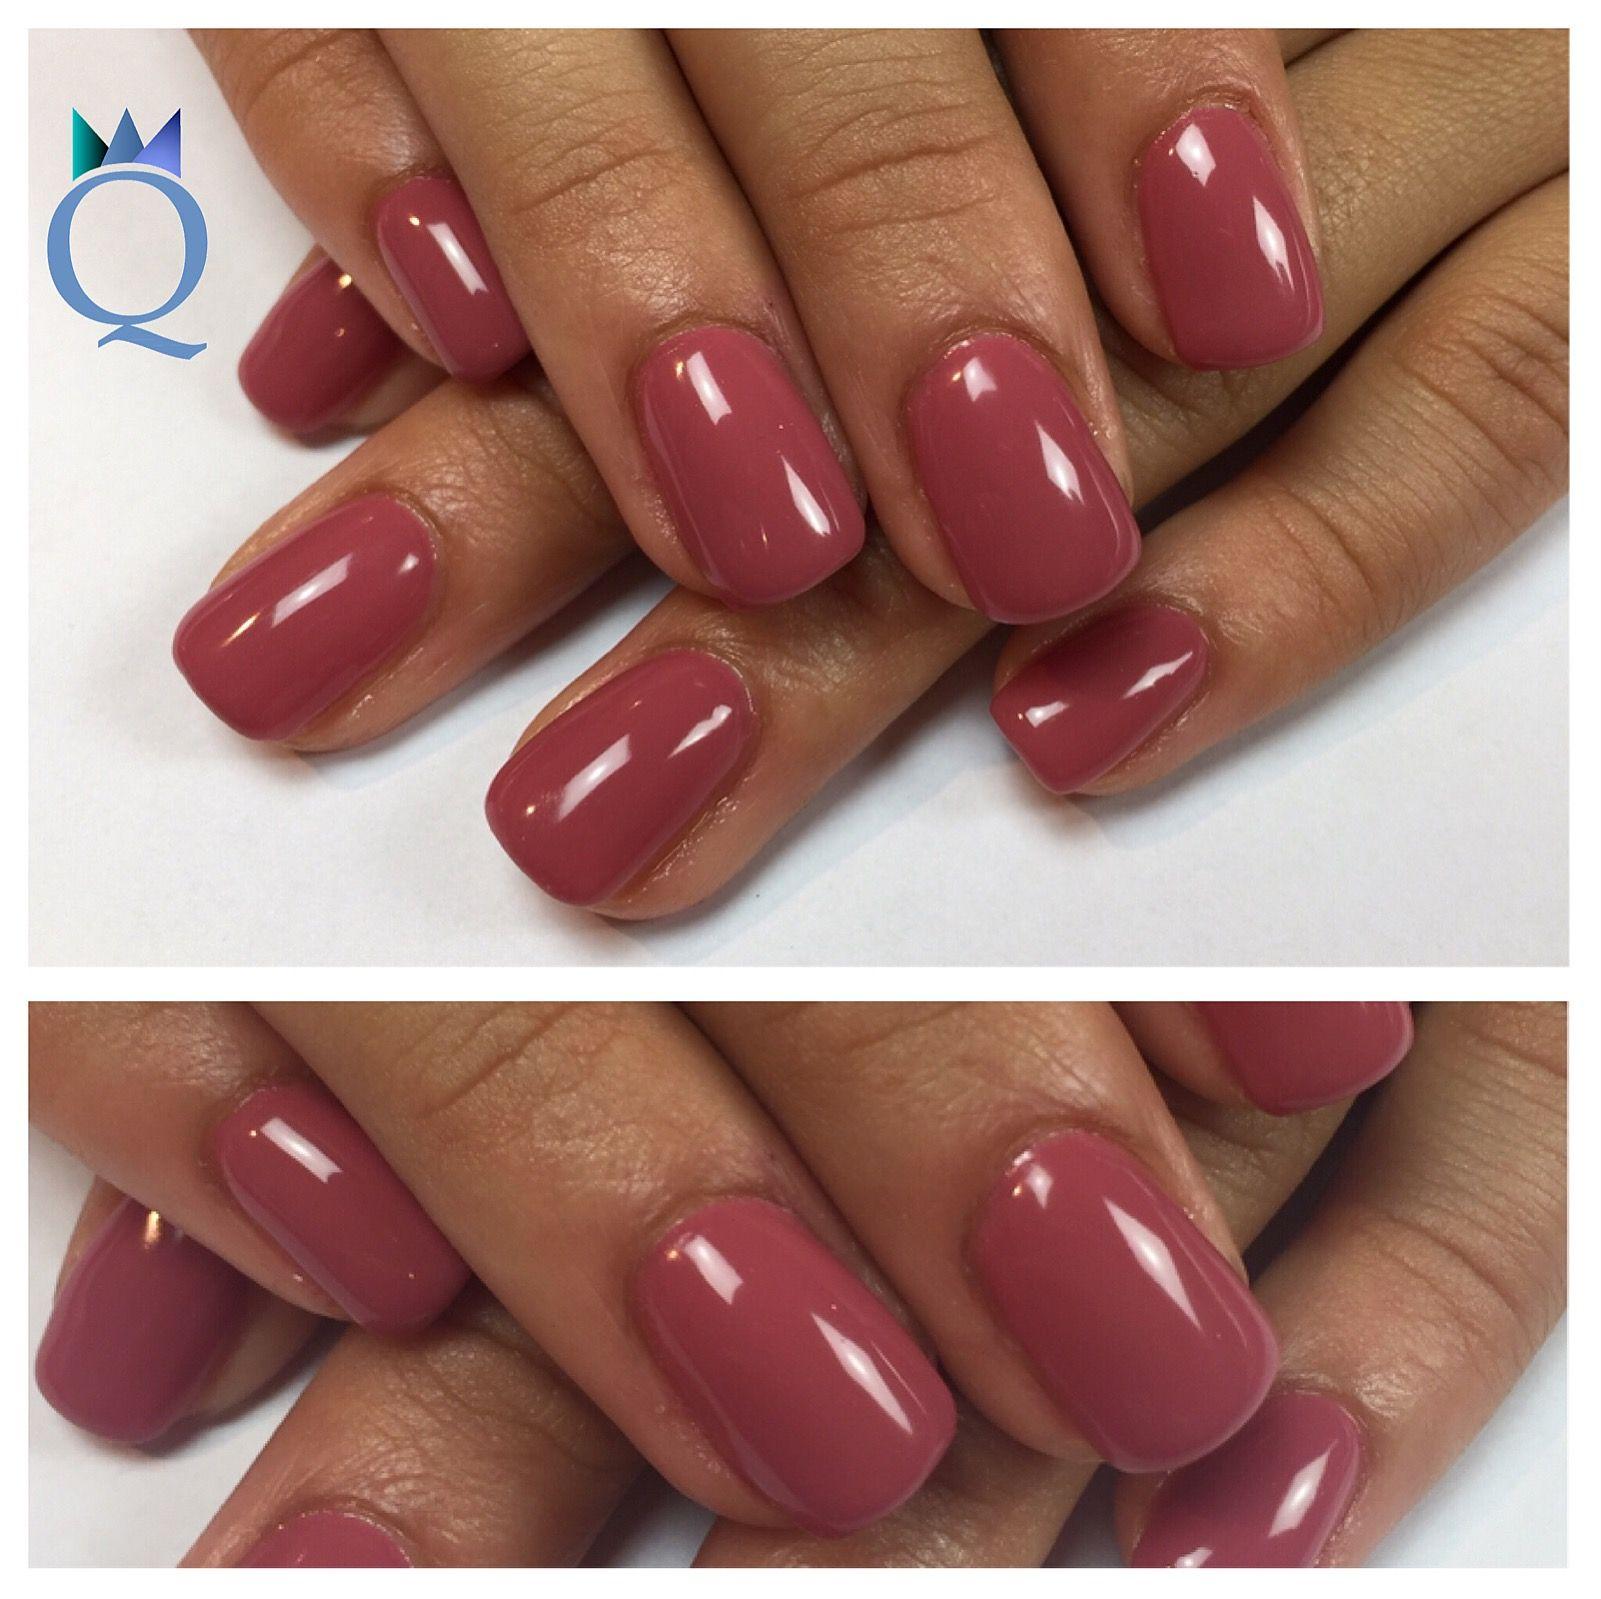 shortnails #gelnails #nails #plume #fallnails #kurzenägel #gelnägel ...